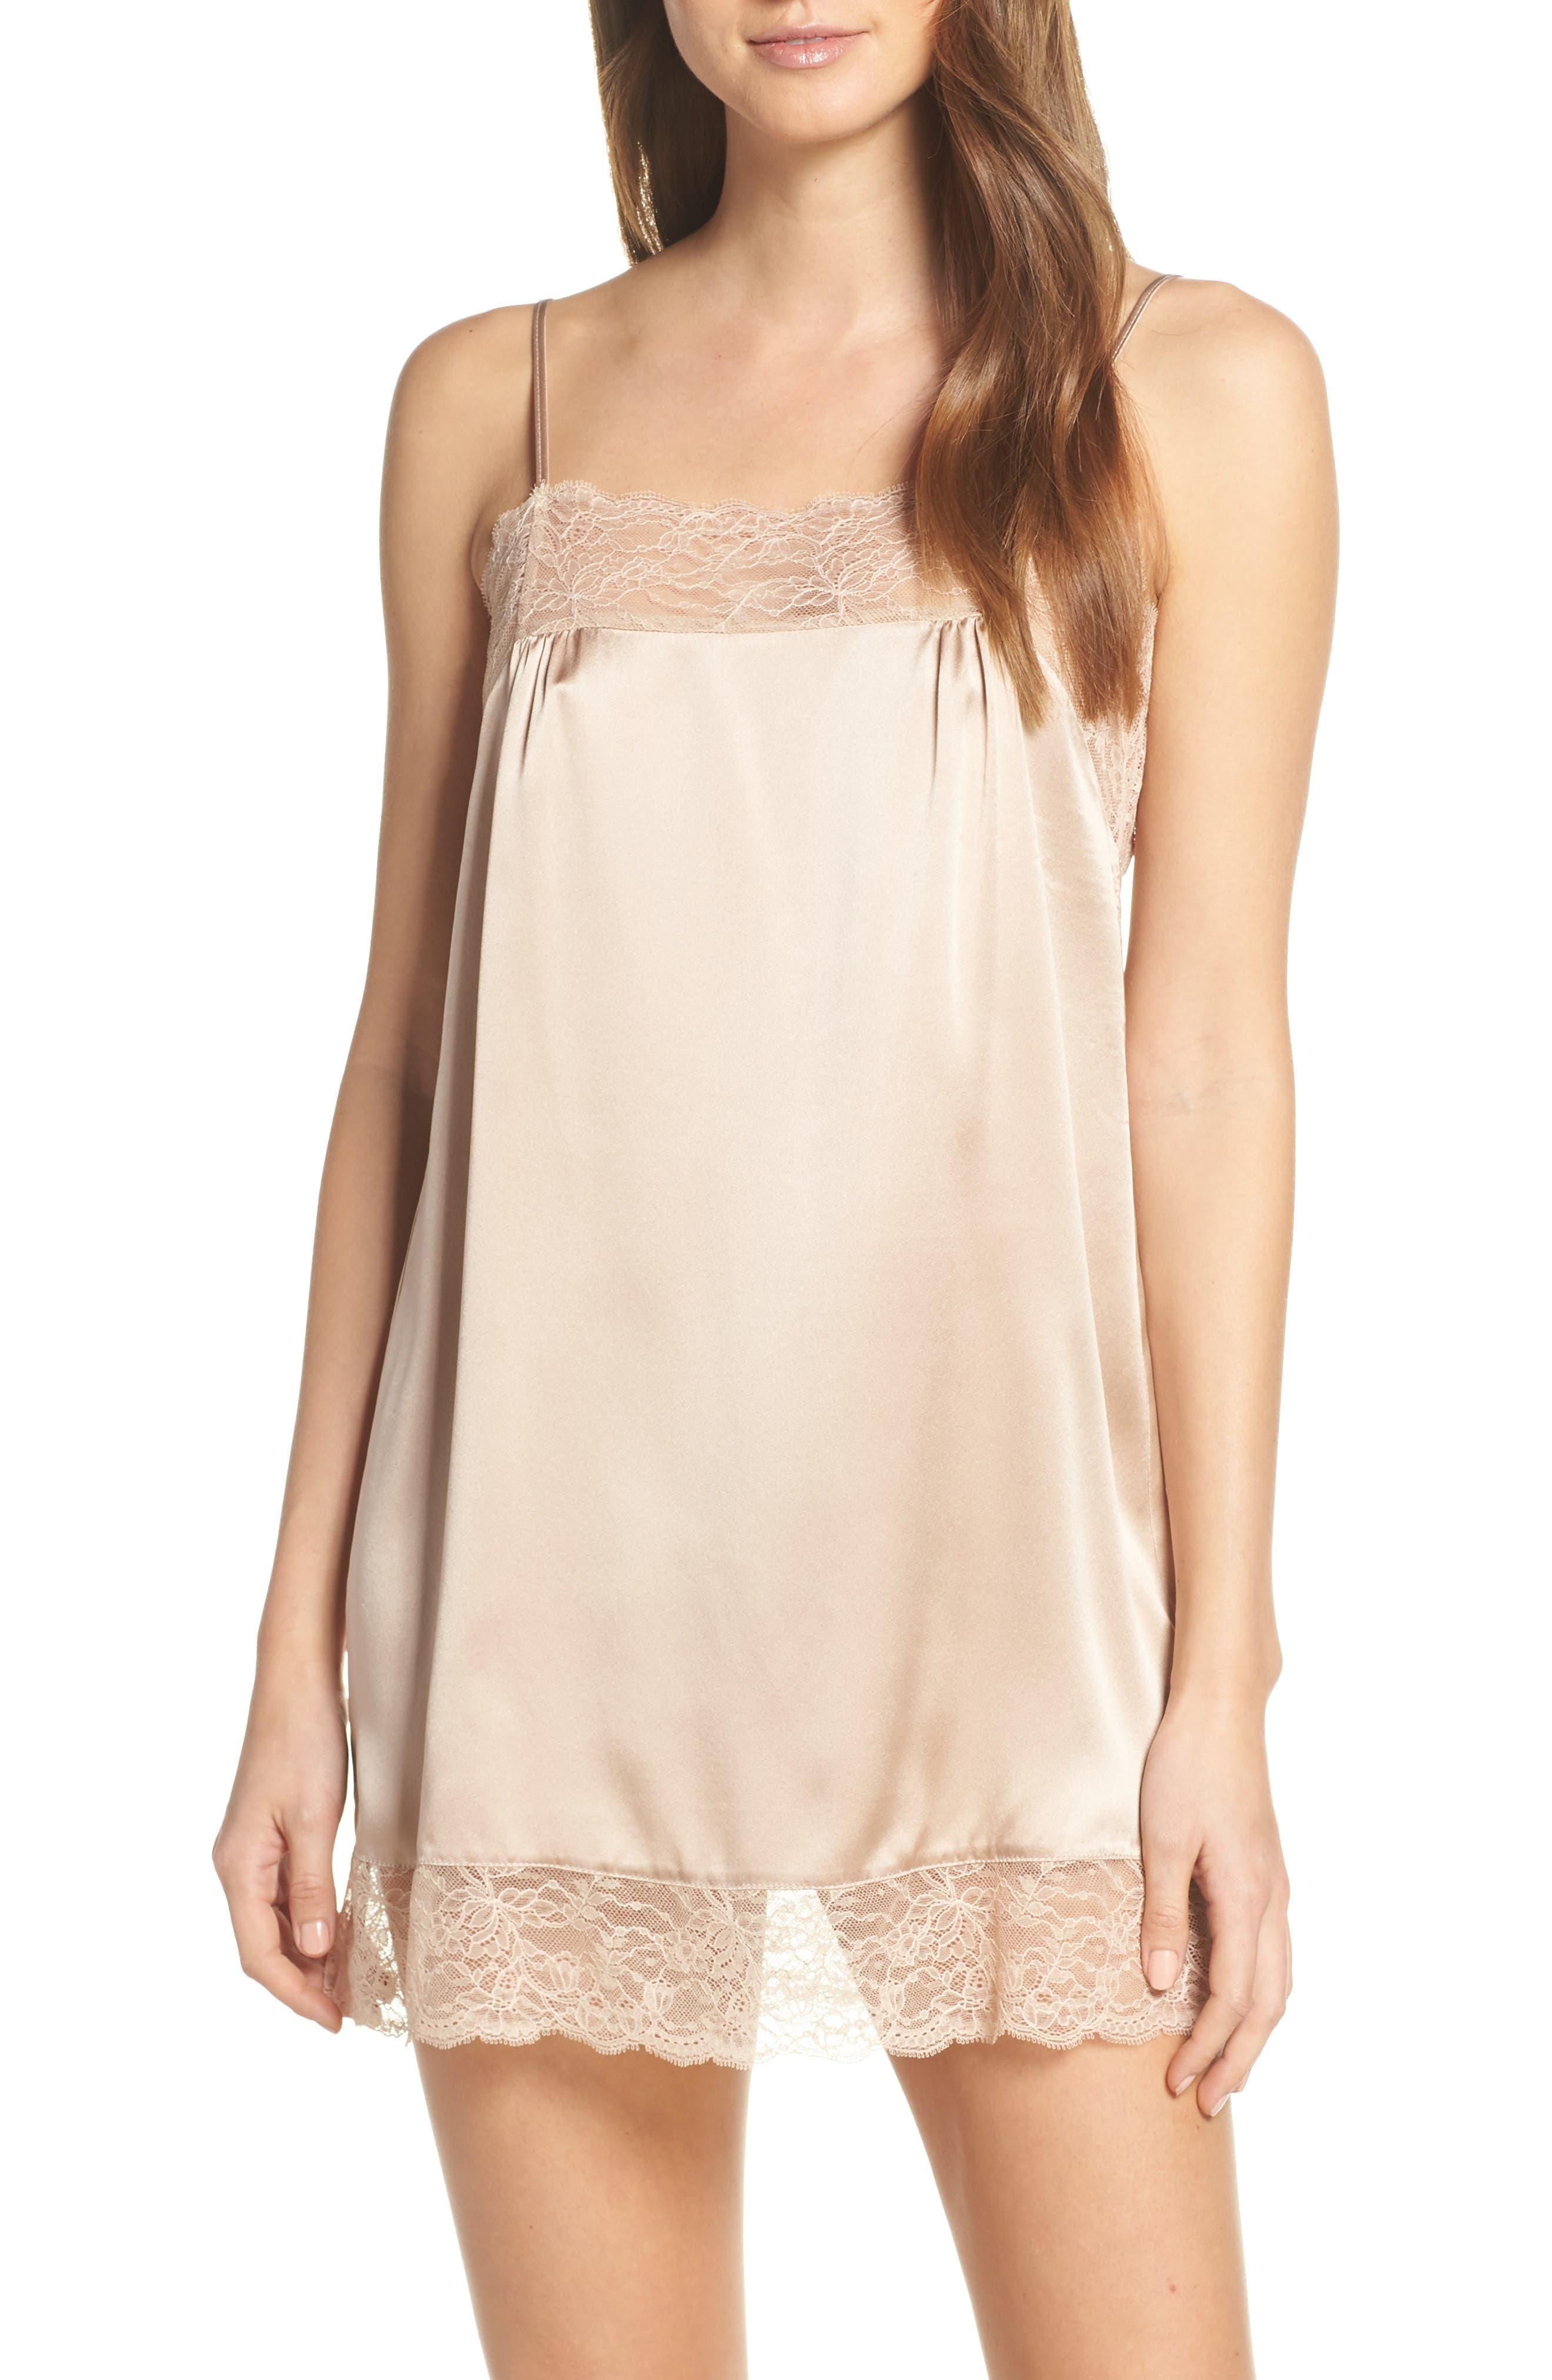 1920s Style Underwear, Lingerie, Nightgowns, Pajamas Womens Samantha Chang Jasmine Silk Chemise $300.00 AT vintagedancer.com